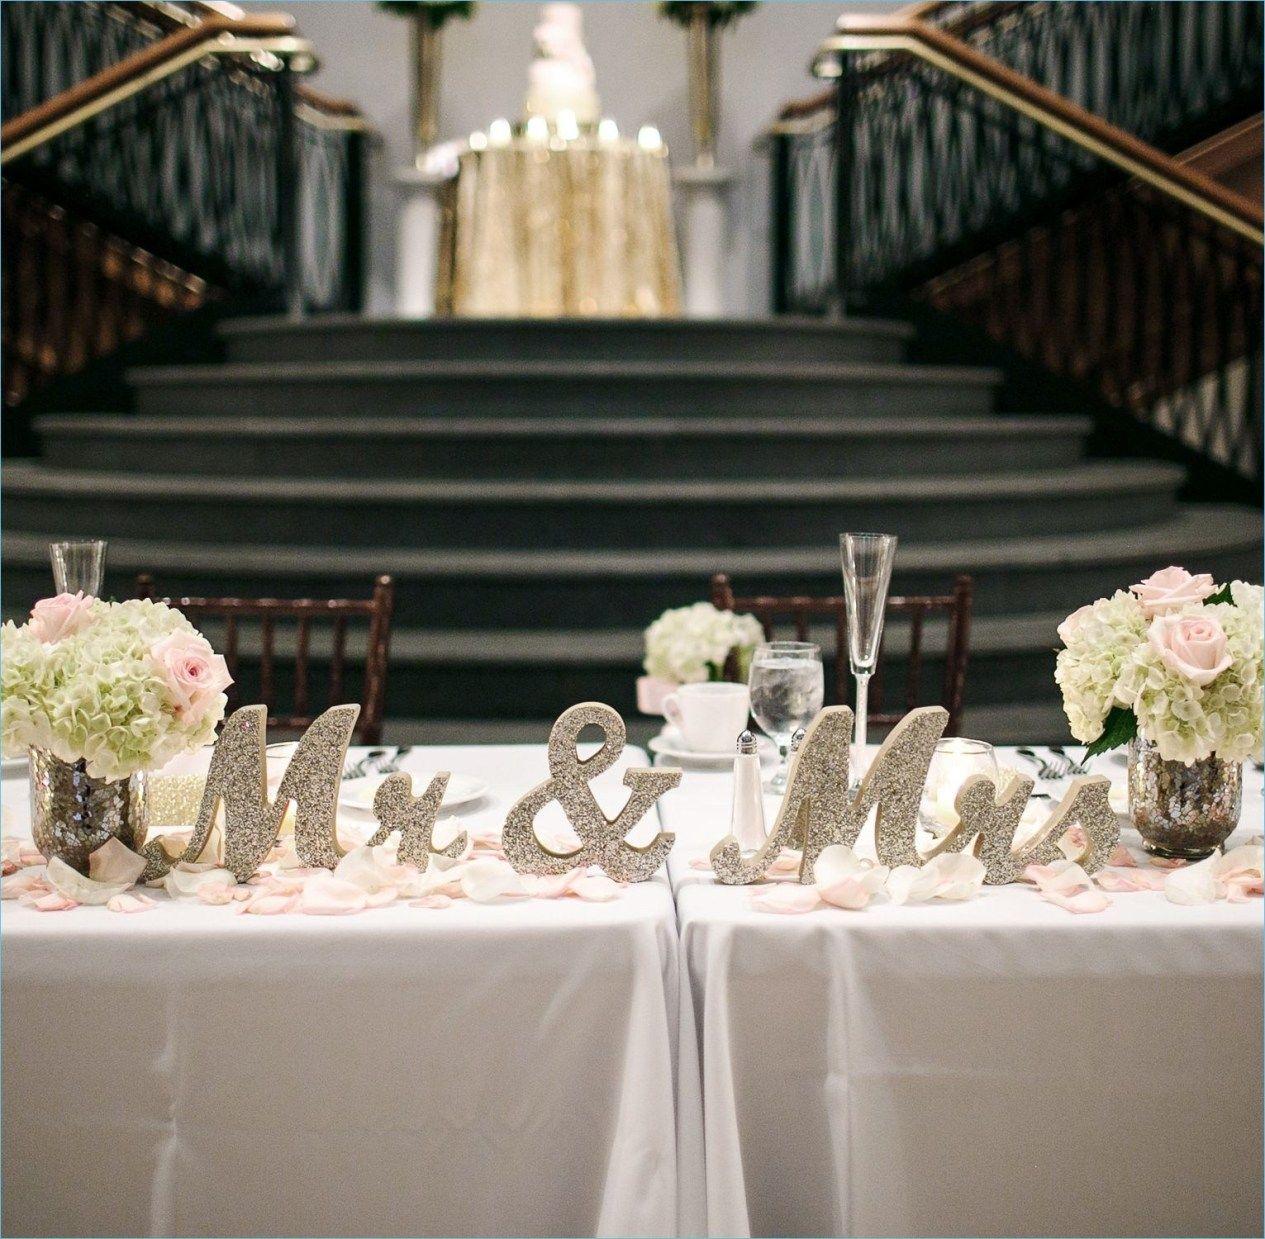 40 Stunning Bride and Groom Table Ideas